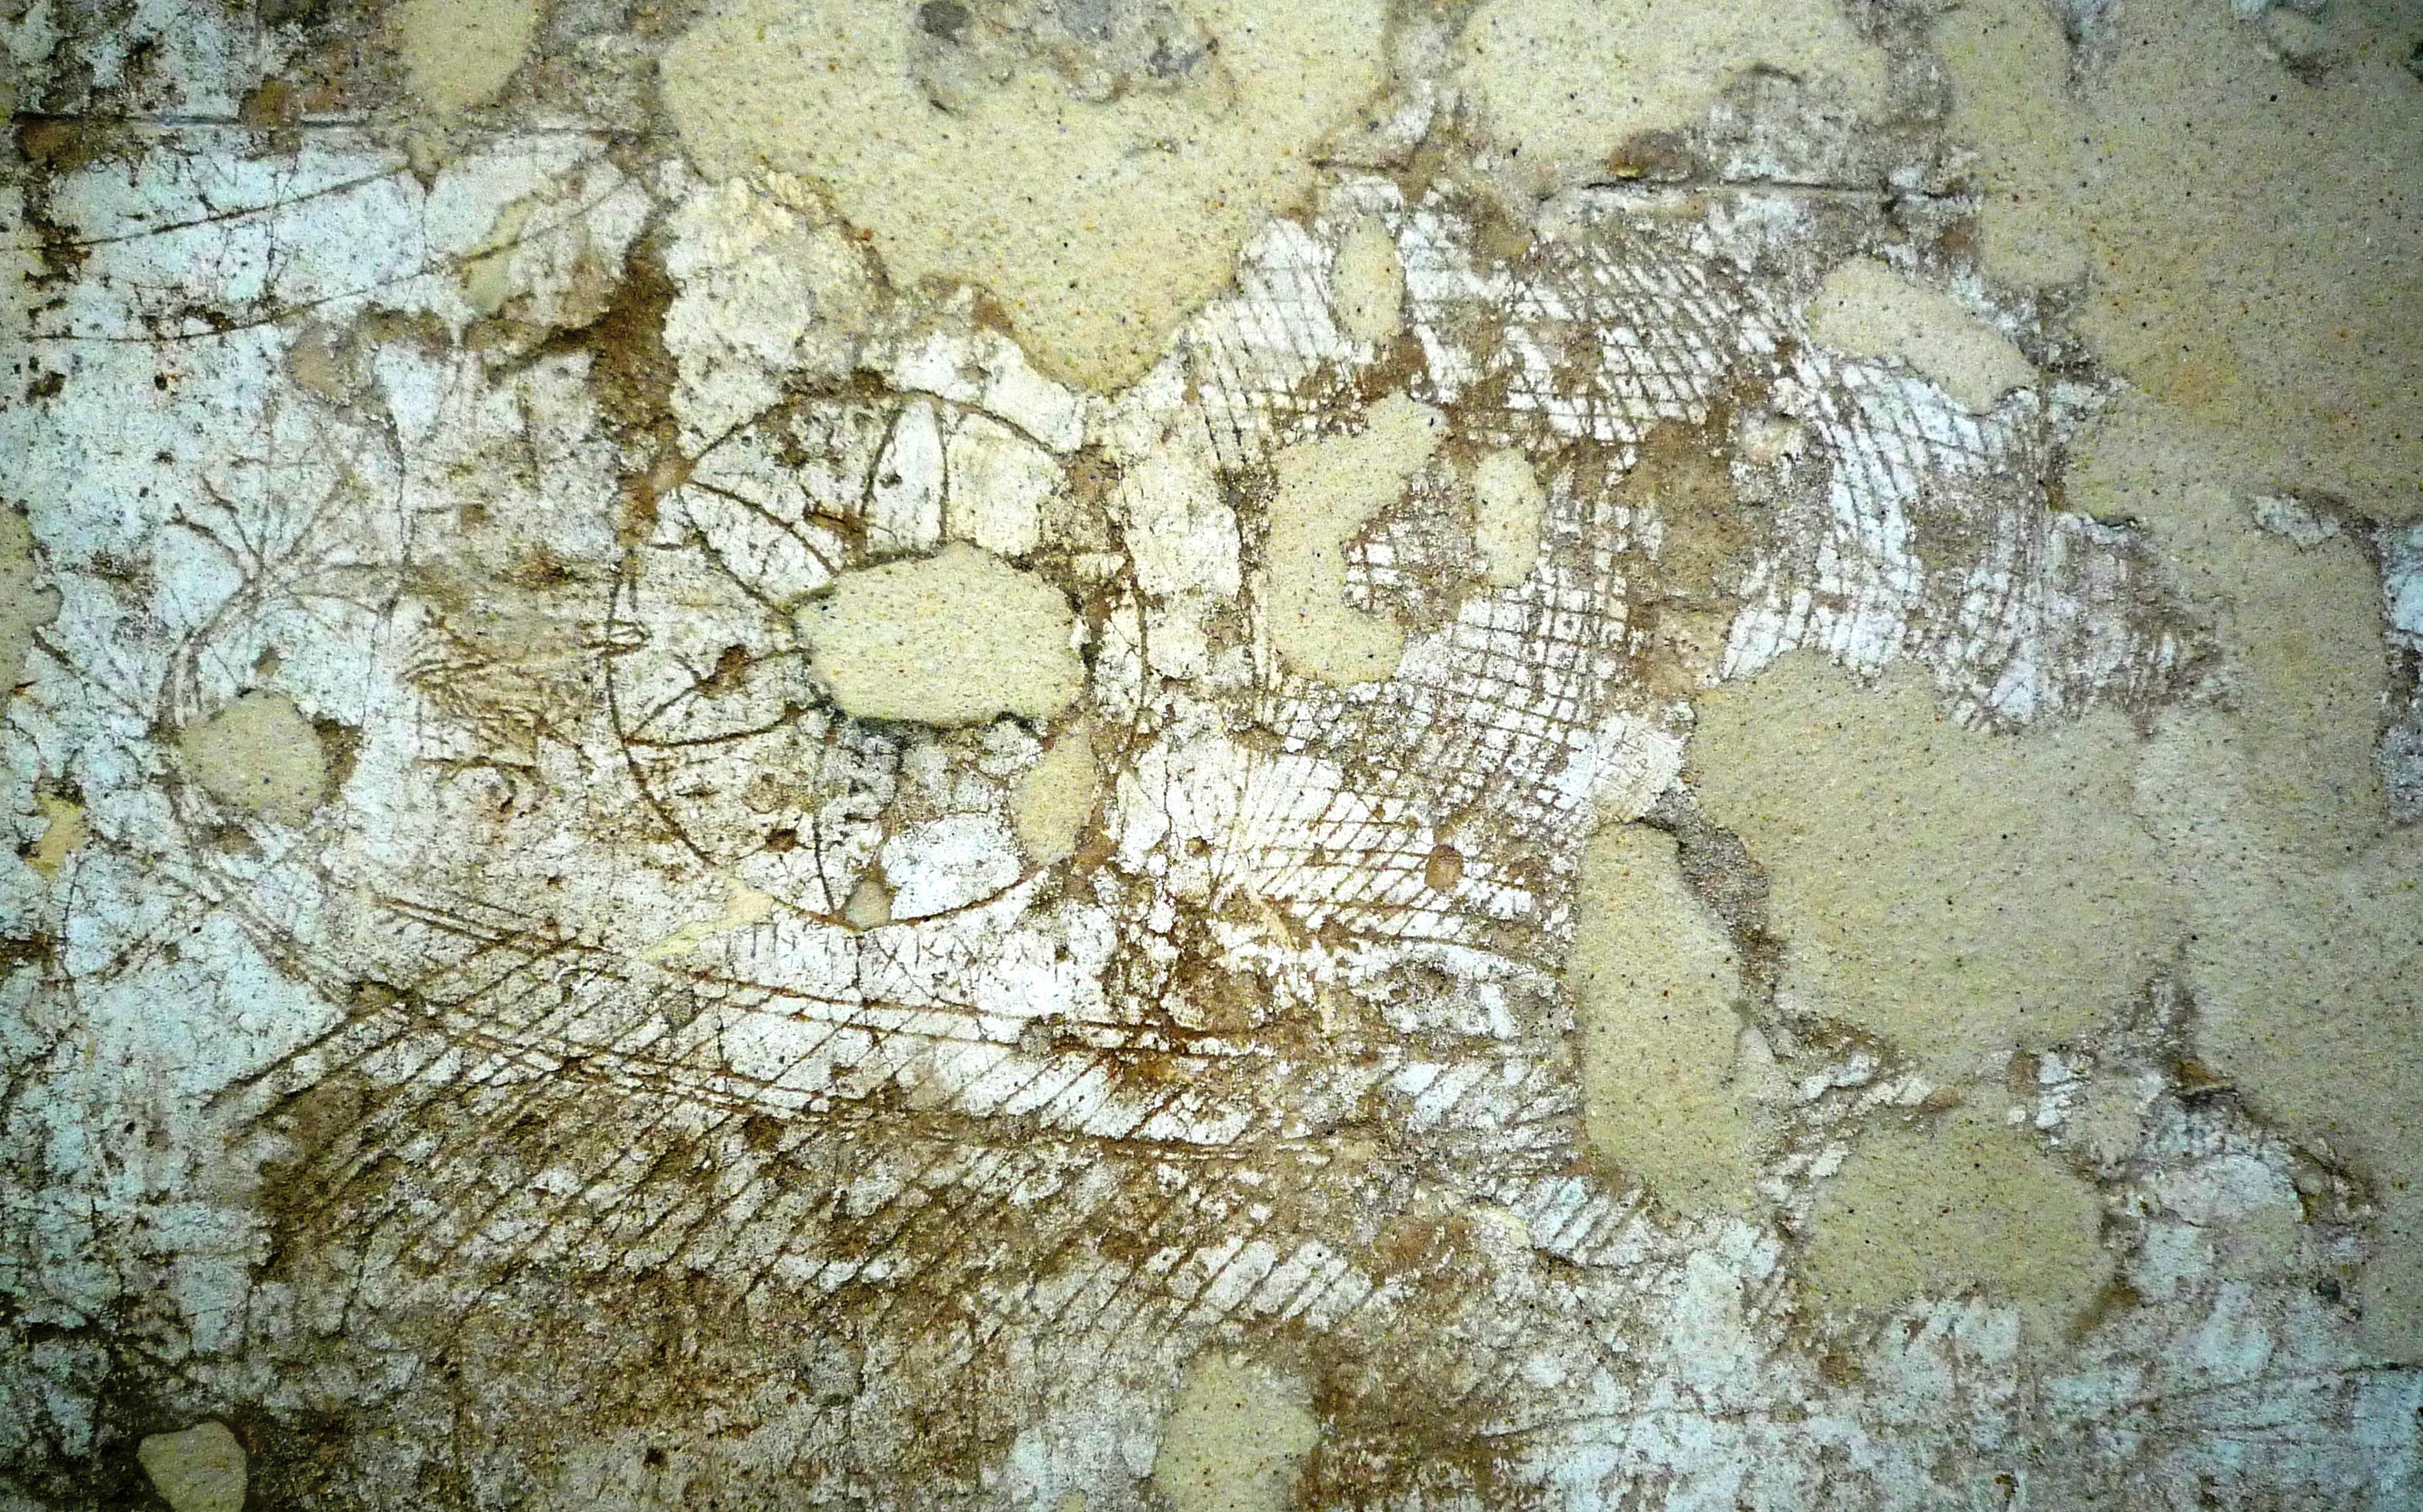 http://www.ancientportsantiques.com/wp-content/uploads/2011/07/Delos-Graffito50oars.jpg